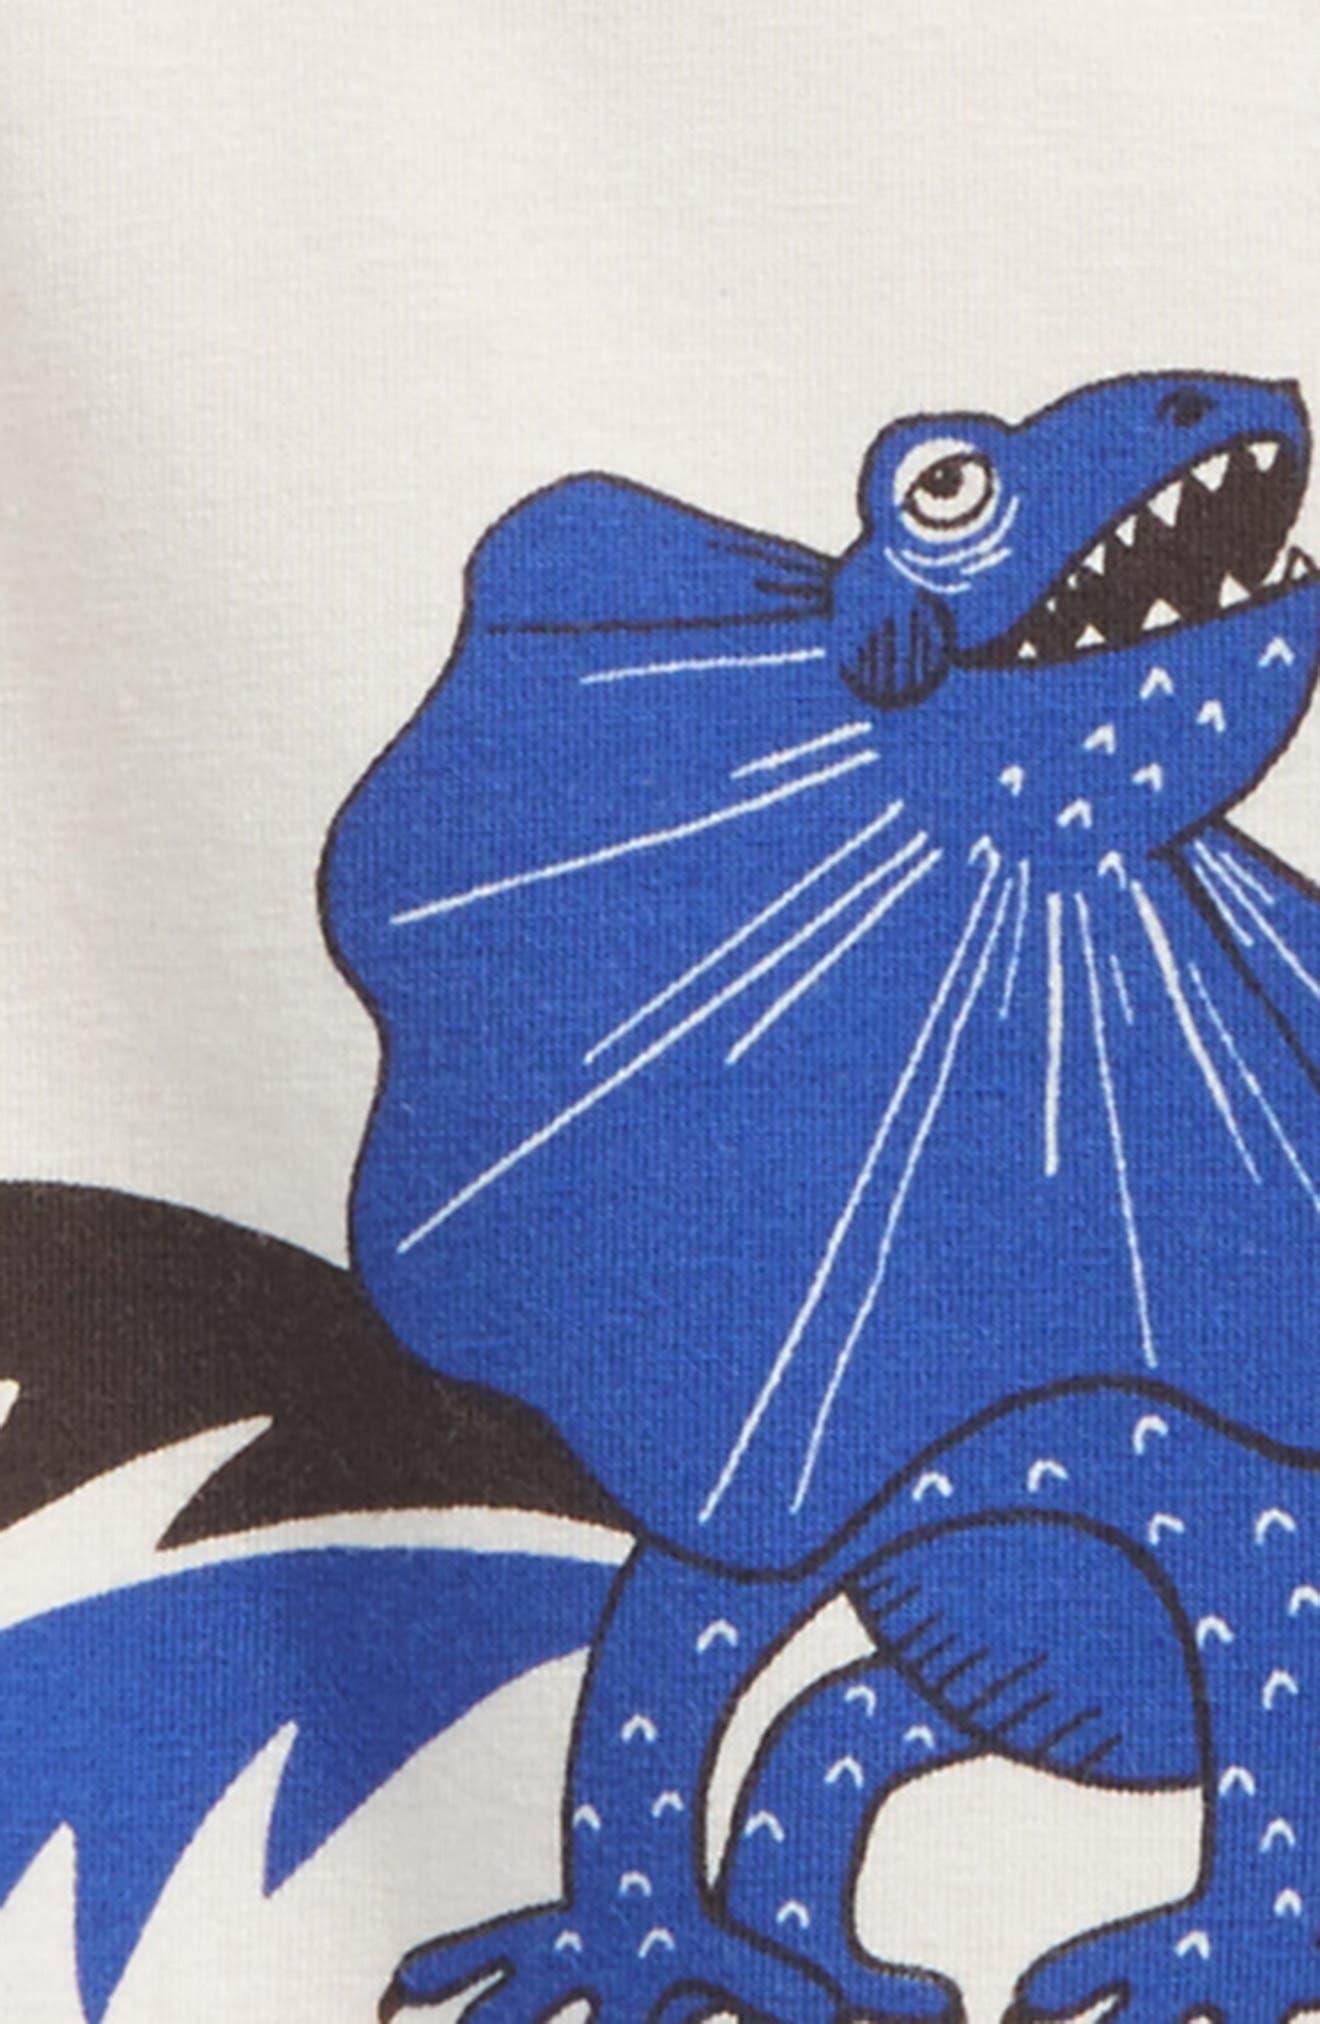 Draco Stretch Organic Cotton T-Shirt,                             Alternate thumbnail 2, color,                             Blue